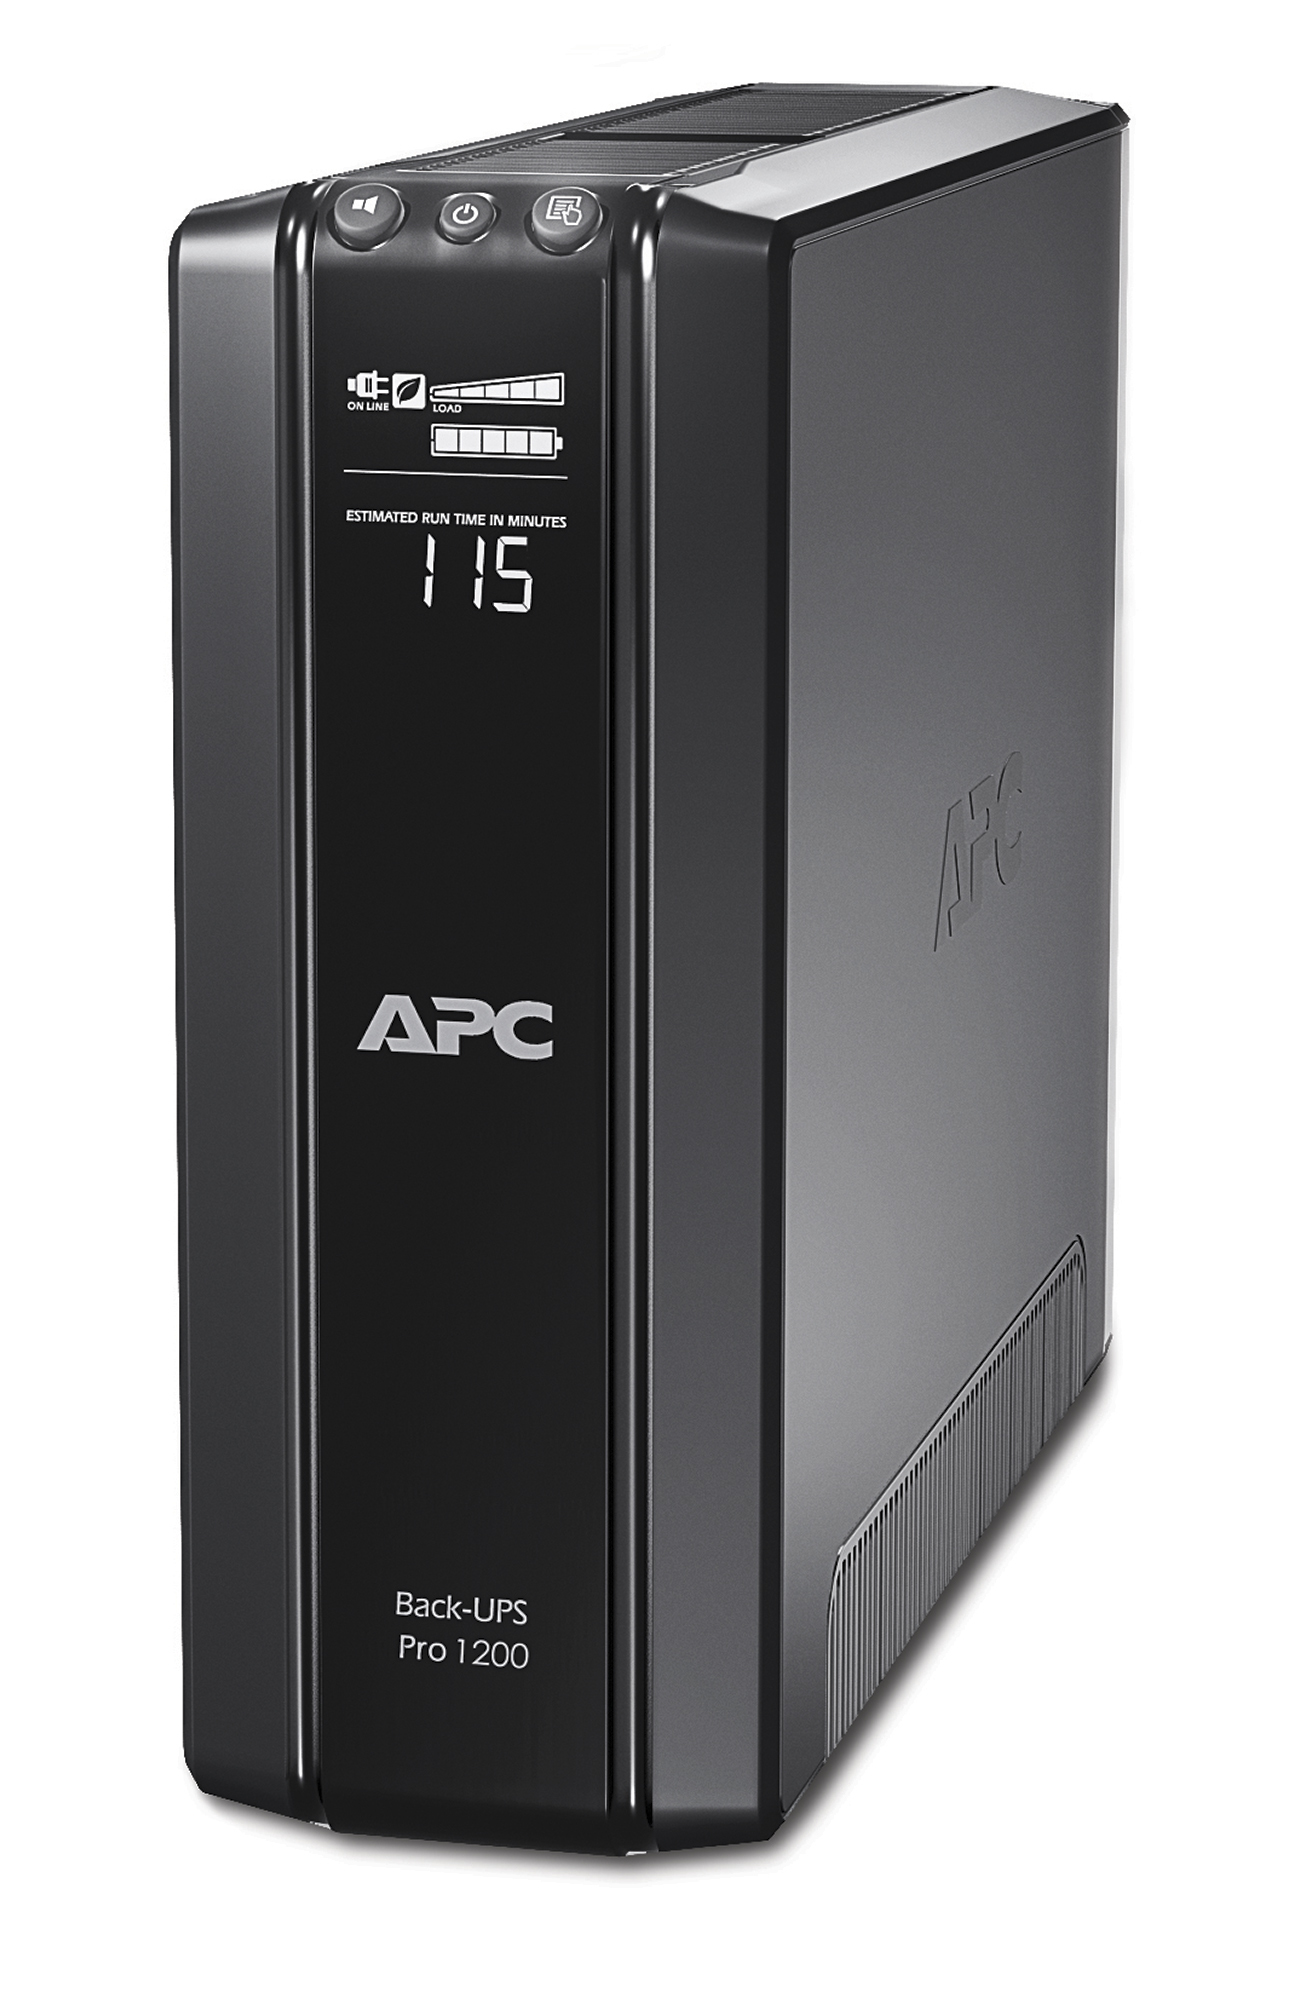 APC Back-UPS Pro sistema de alimentación ininterrumpida (UPS) Línea interactiva 1200 VA 720 W